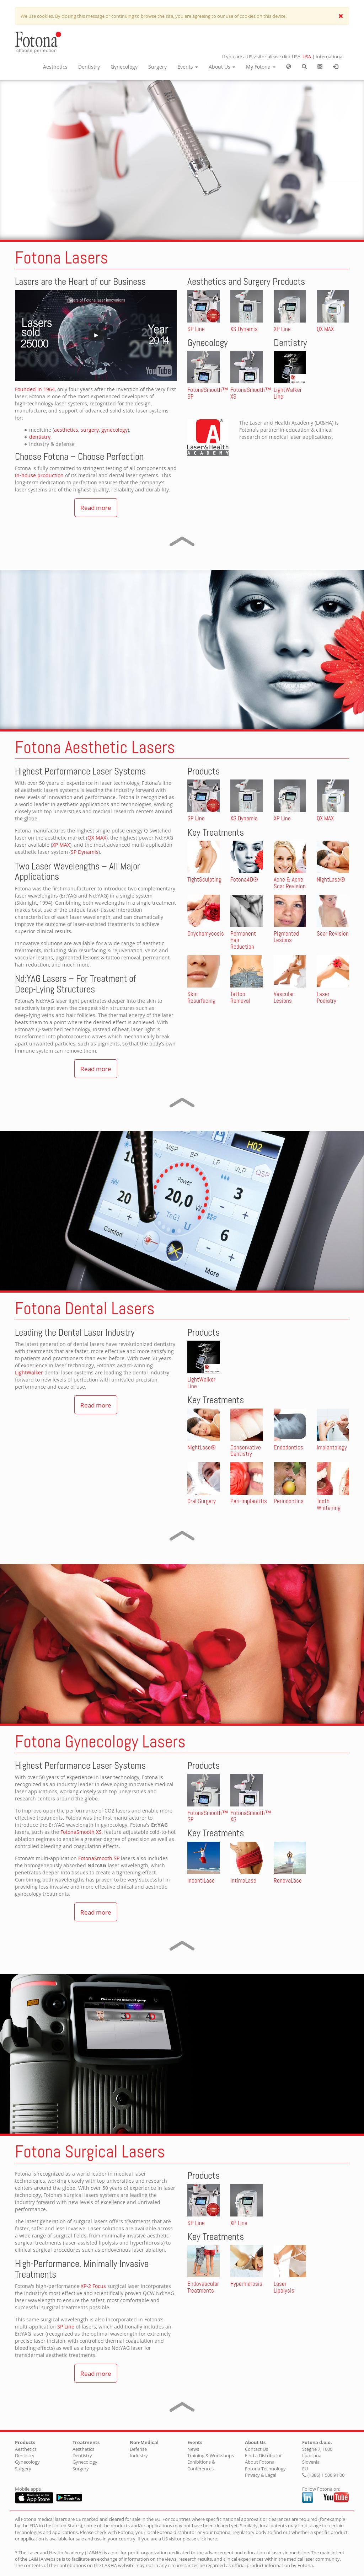 Fotona Competitors, Revenue and Employees - Owler Company